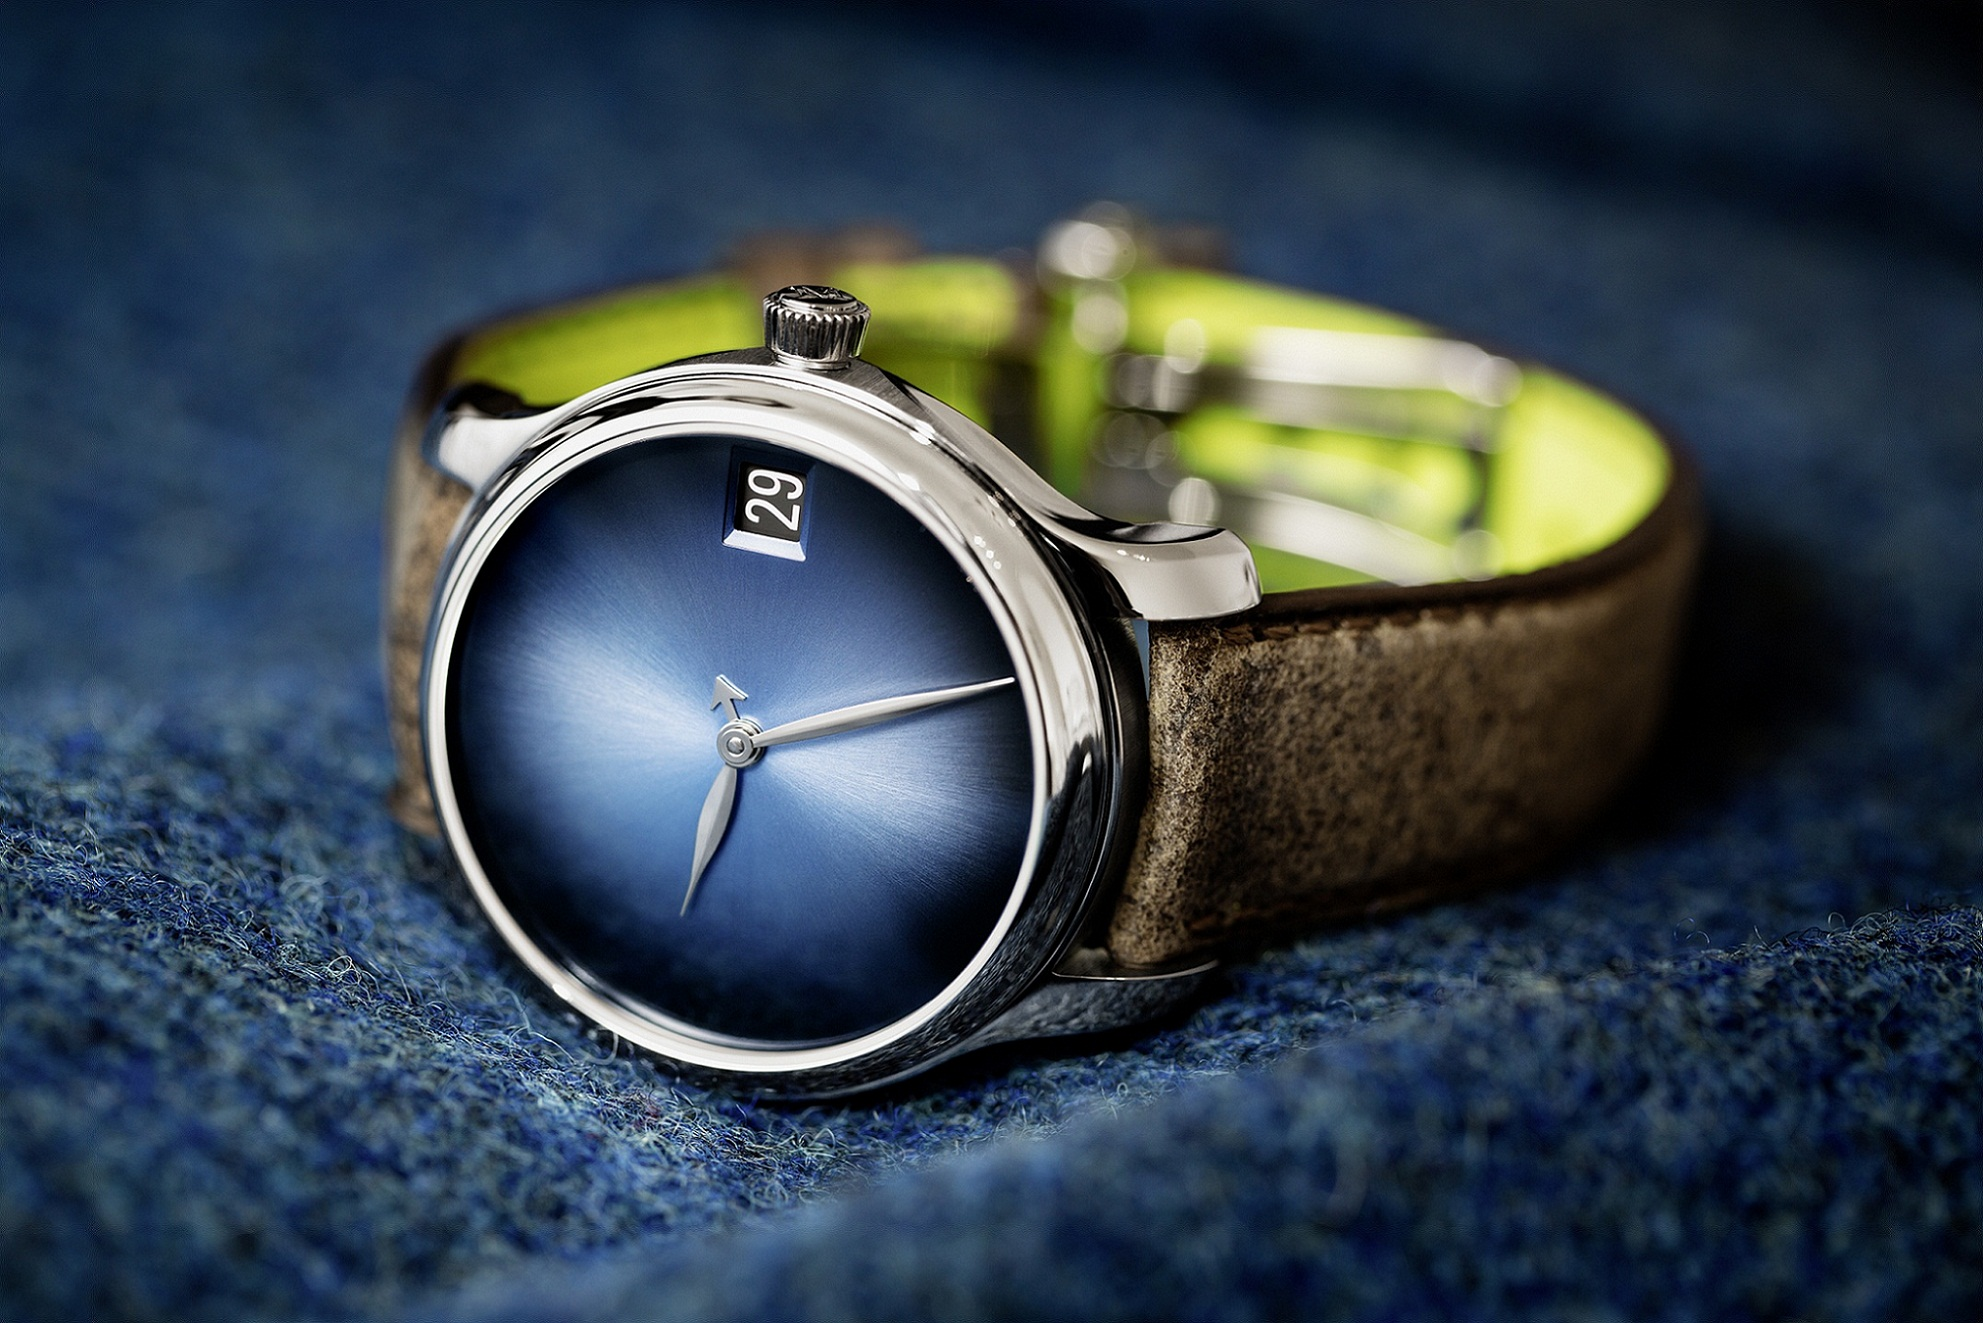 H. Moser & Cie.的煙薰錶盤(fumé dials)設計,是極具魅力的視覺享受。